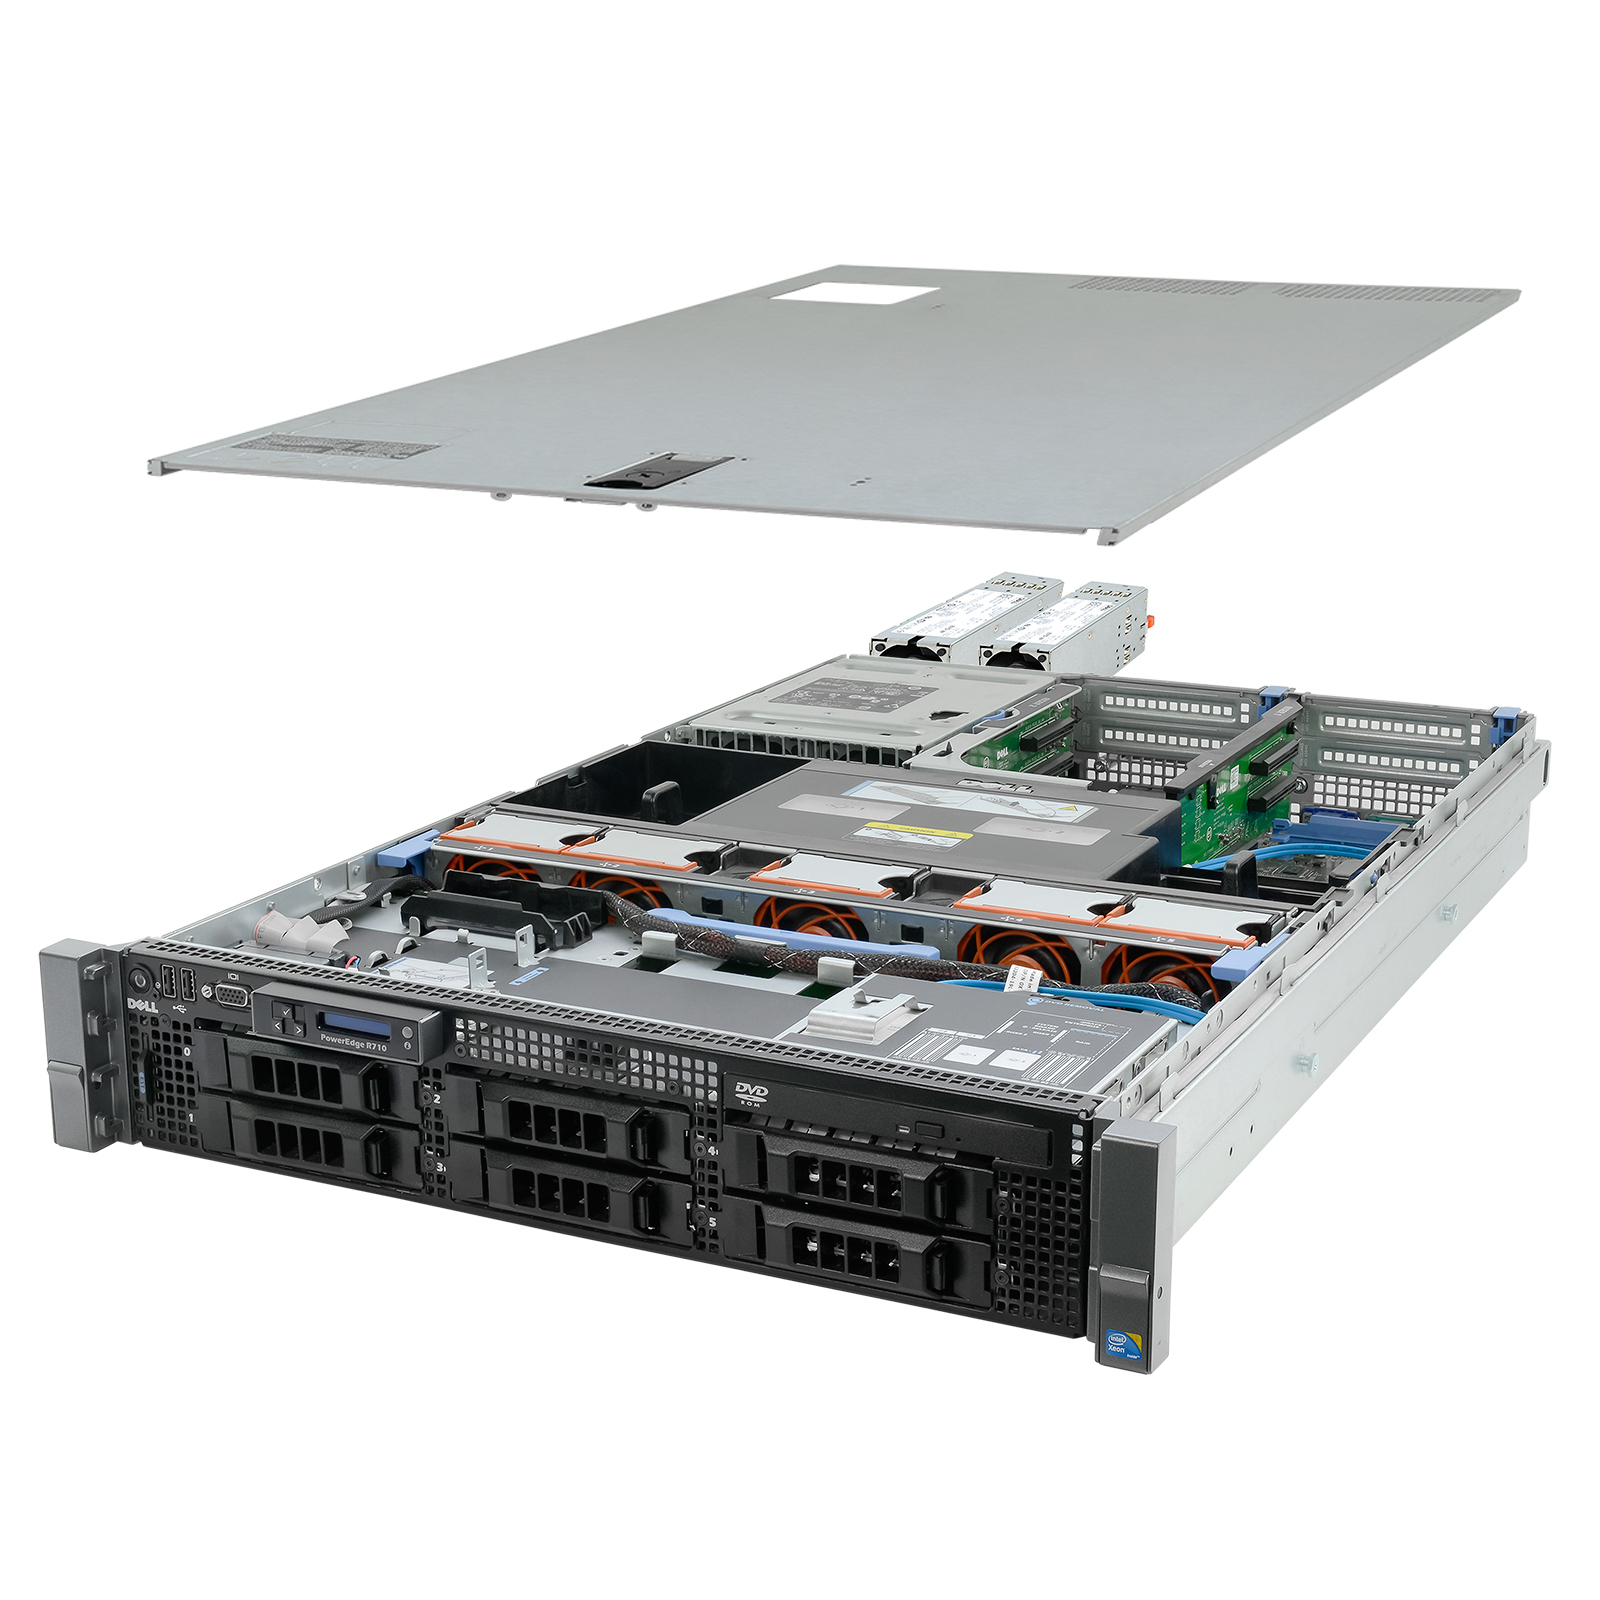 Details about High-End Virtualization Server 12-Core 144GB RAM 12TB RAID  Dell PowerEdge R710